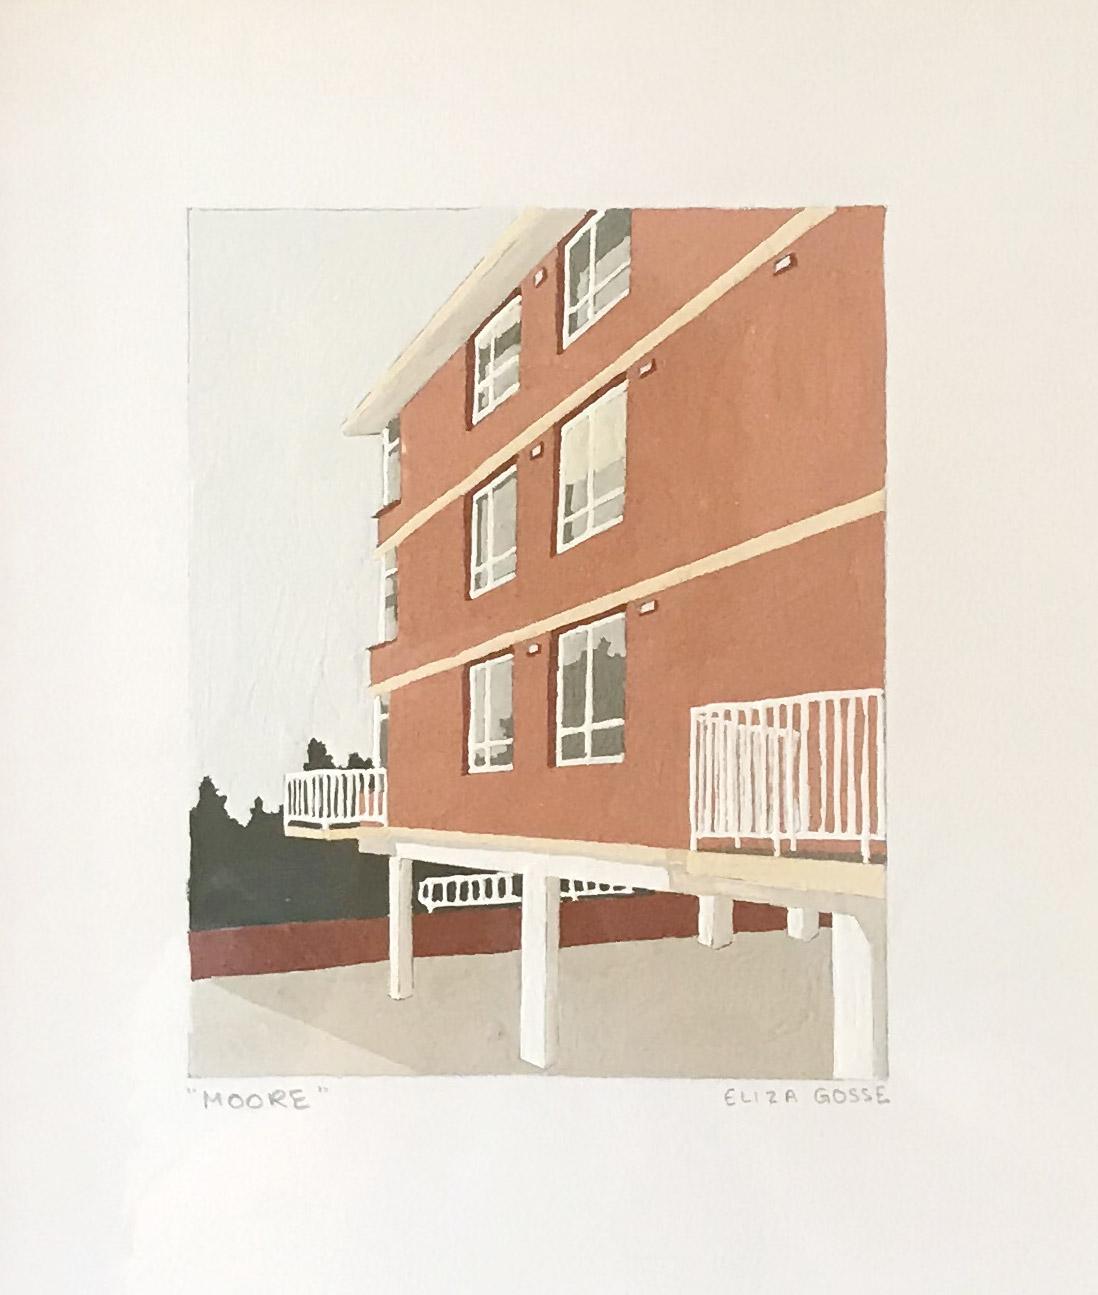 ELIZA GOSSE  Moore , 2019 gouache on paper 15 x 12 cm